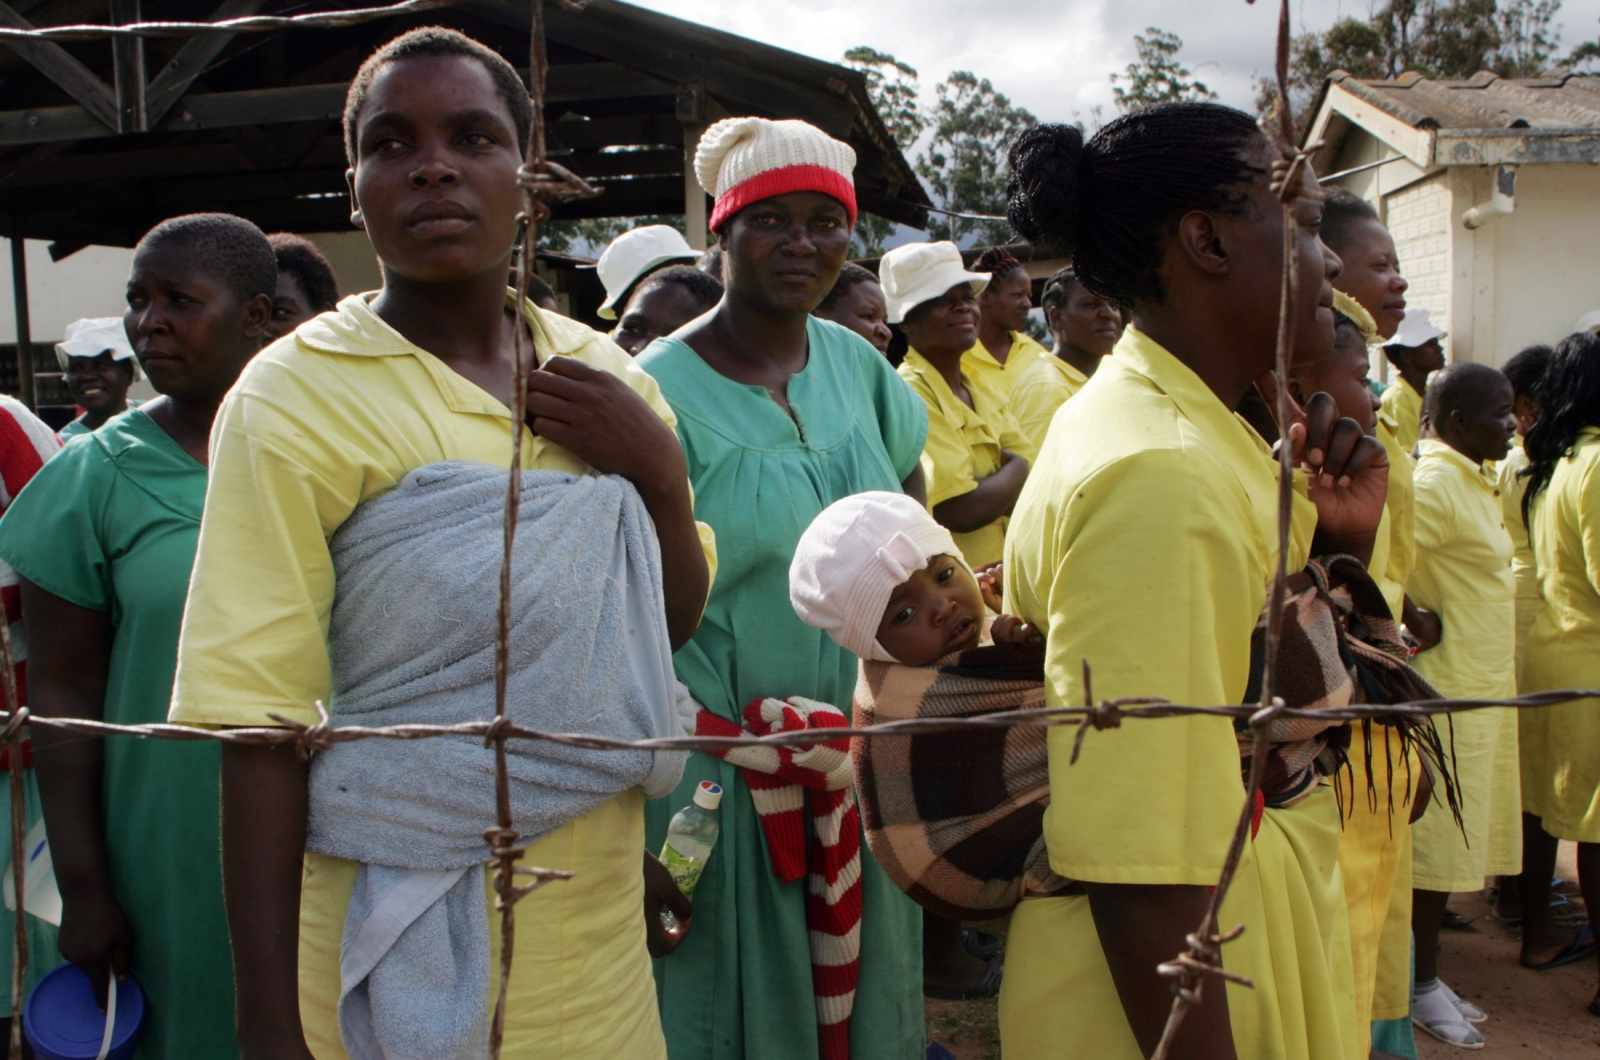 Zimbabwe prisoners pardon